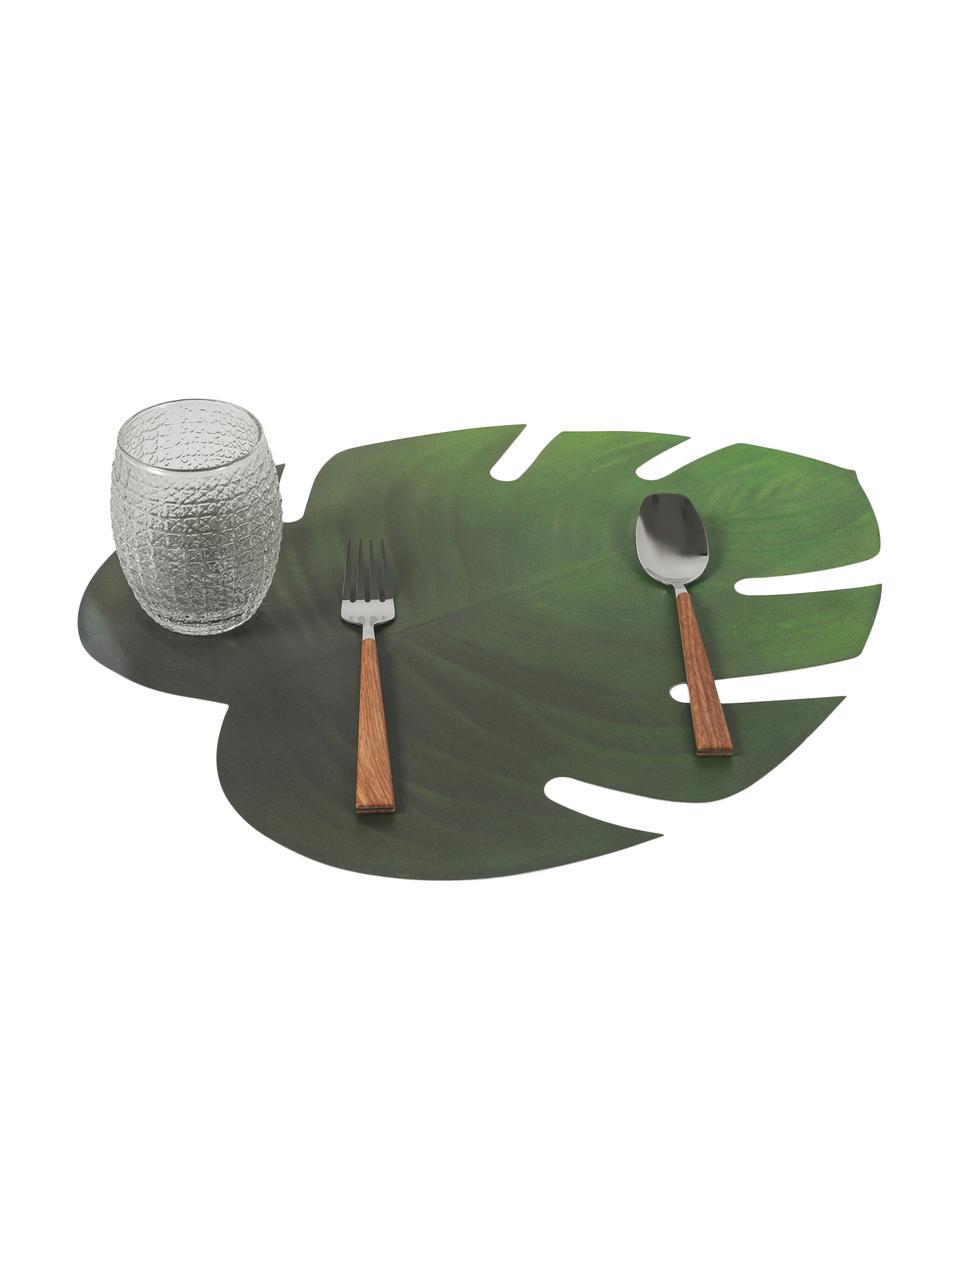 Tovaglietta americana a forma di foglia Jungle 6 pz, Materiale sintetico (PCV), Verde, Larg. 37 x Lung. 47 cm